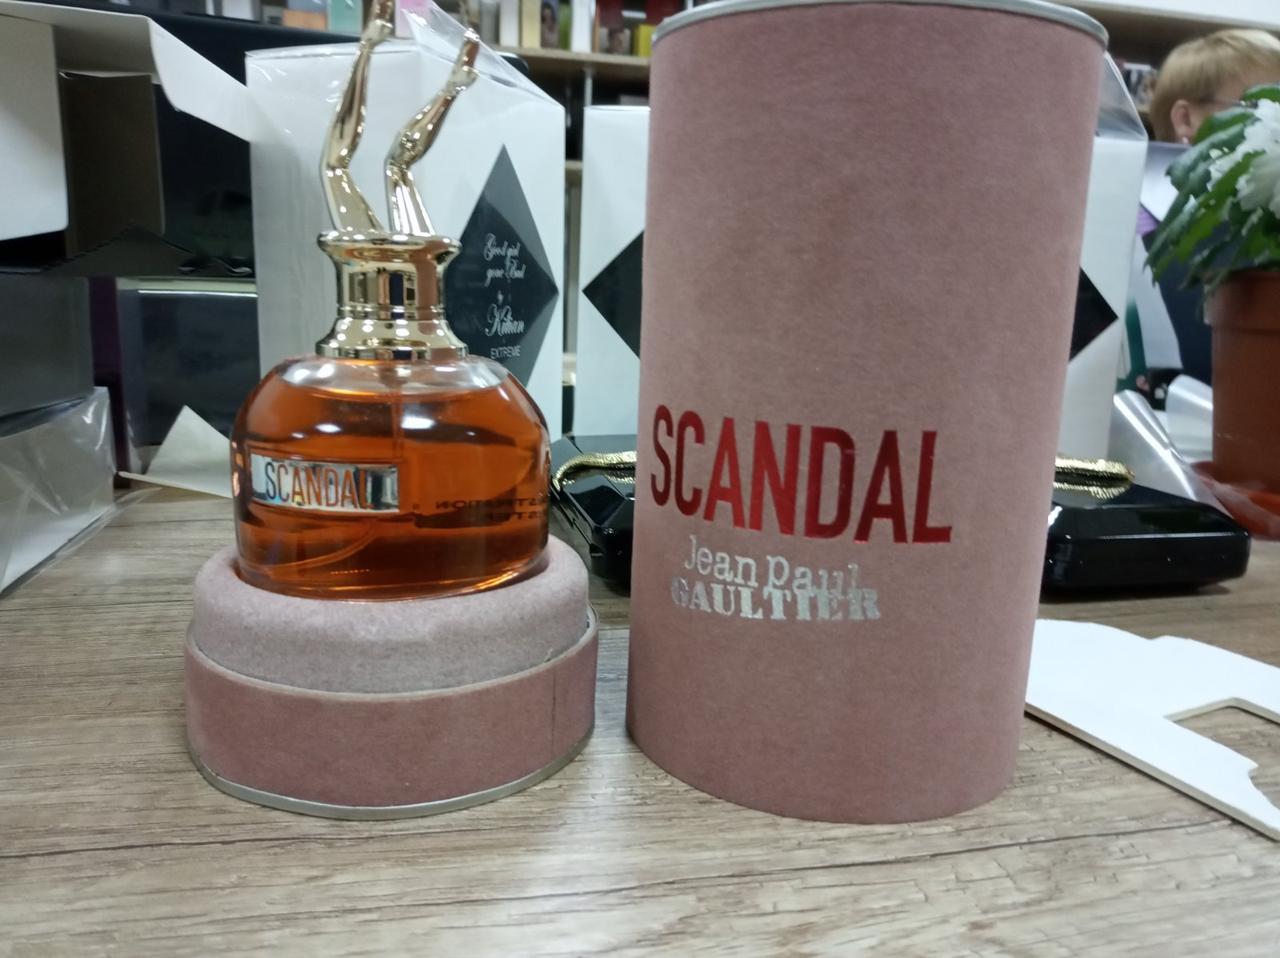 Jean Paul Gaultier Scandal edp 80ml Tester